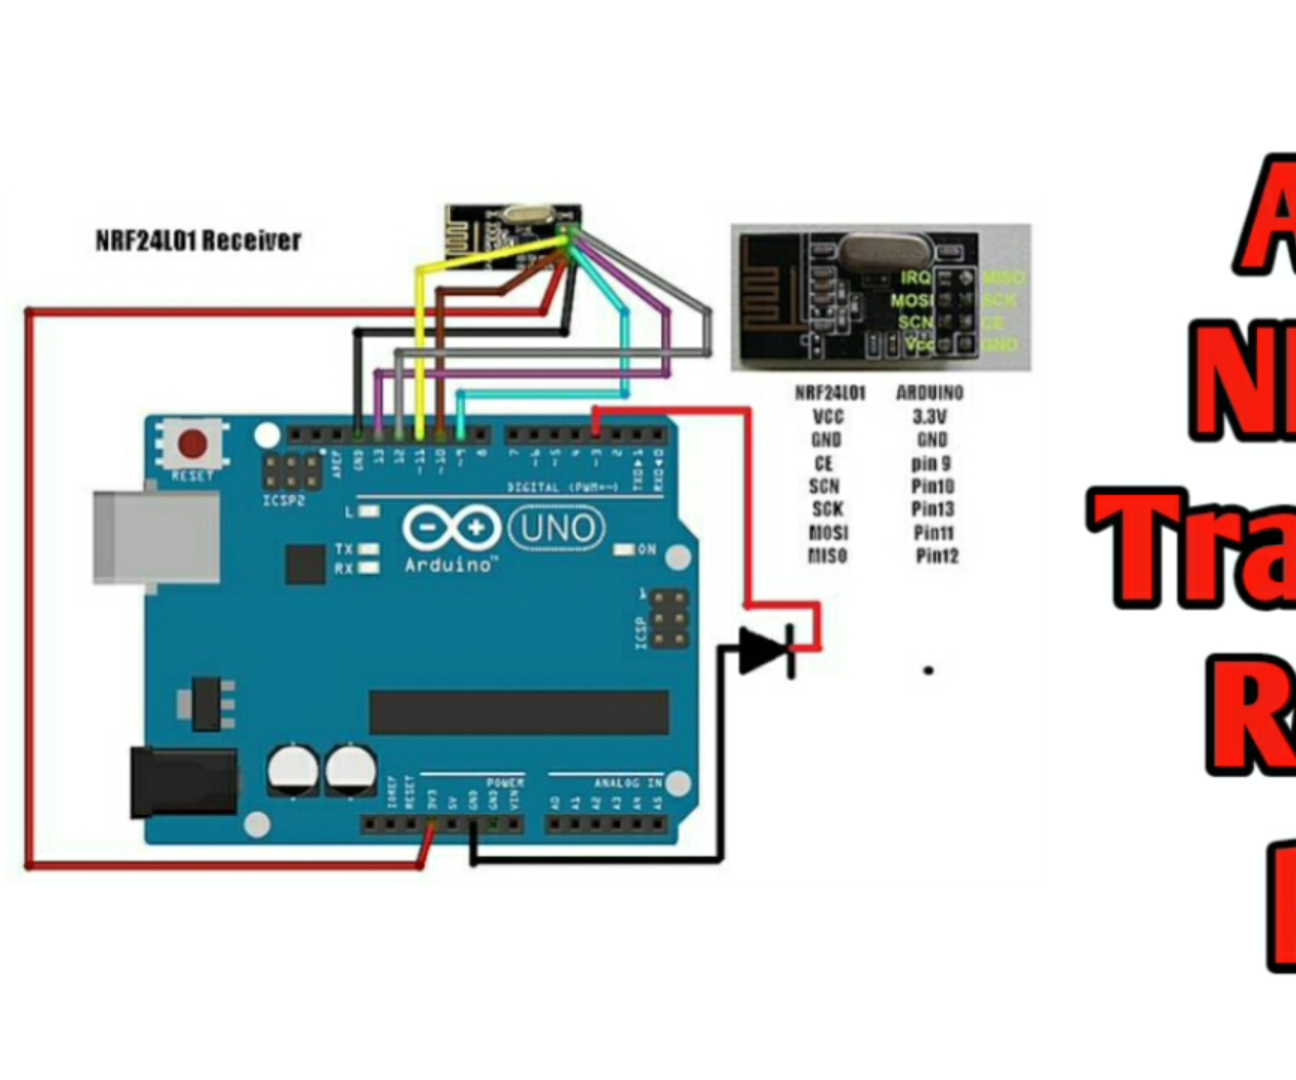 Wireless Remote Using 2 4Ghz NRF24L01 Module With Arduino | Nrf24l01